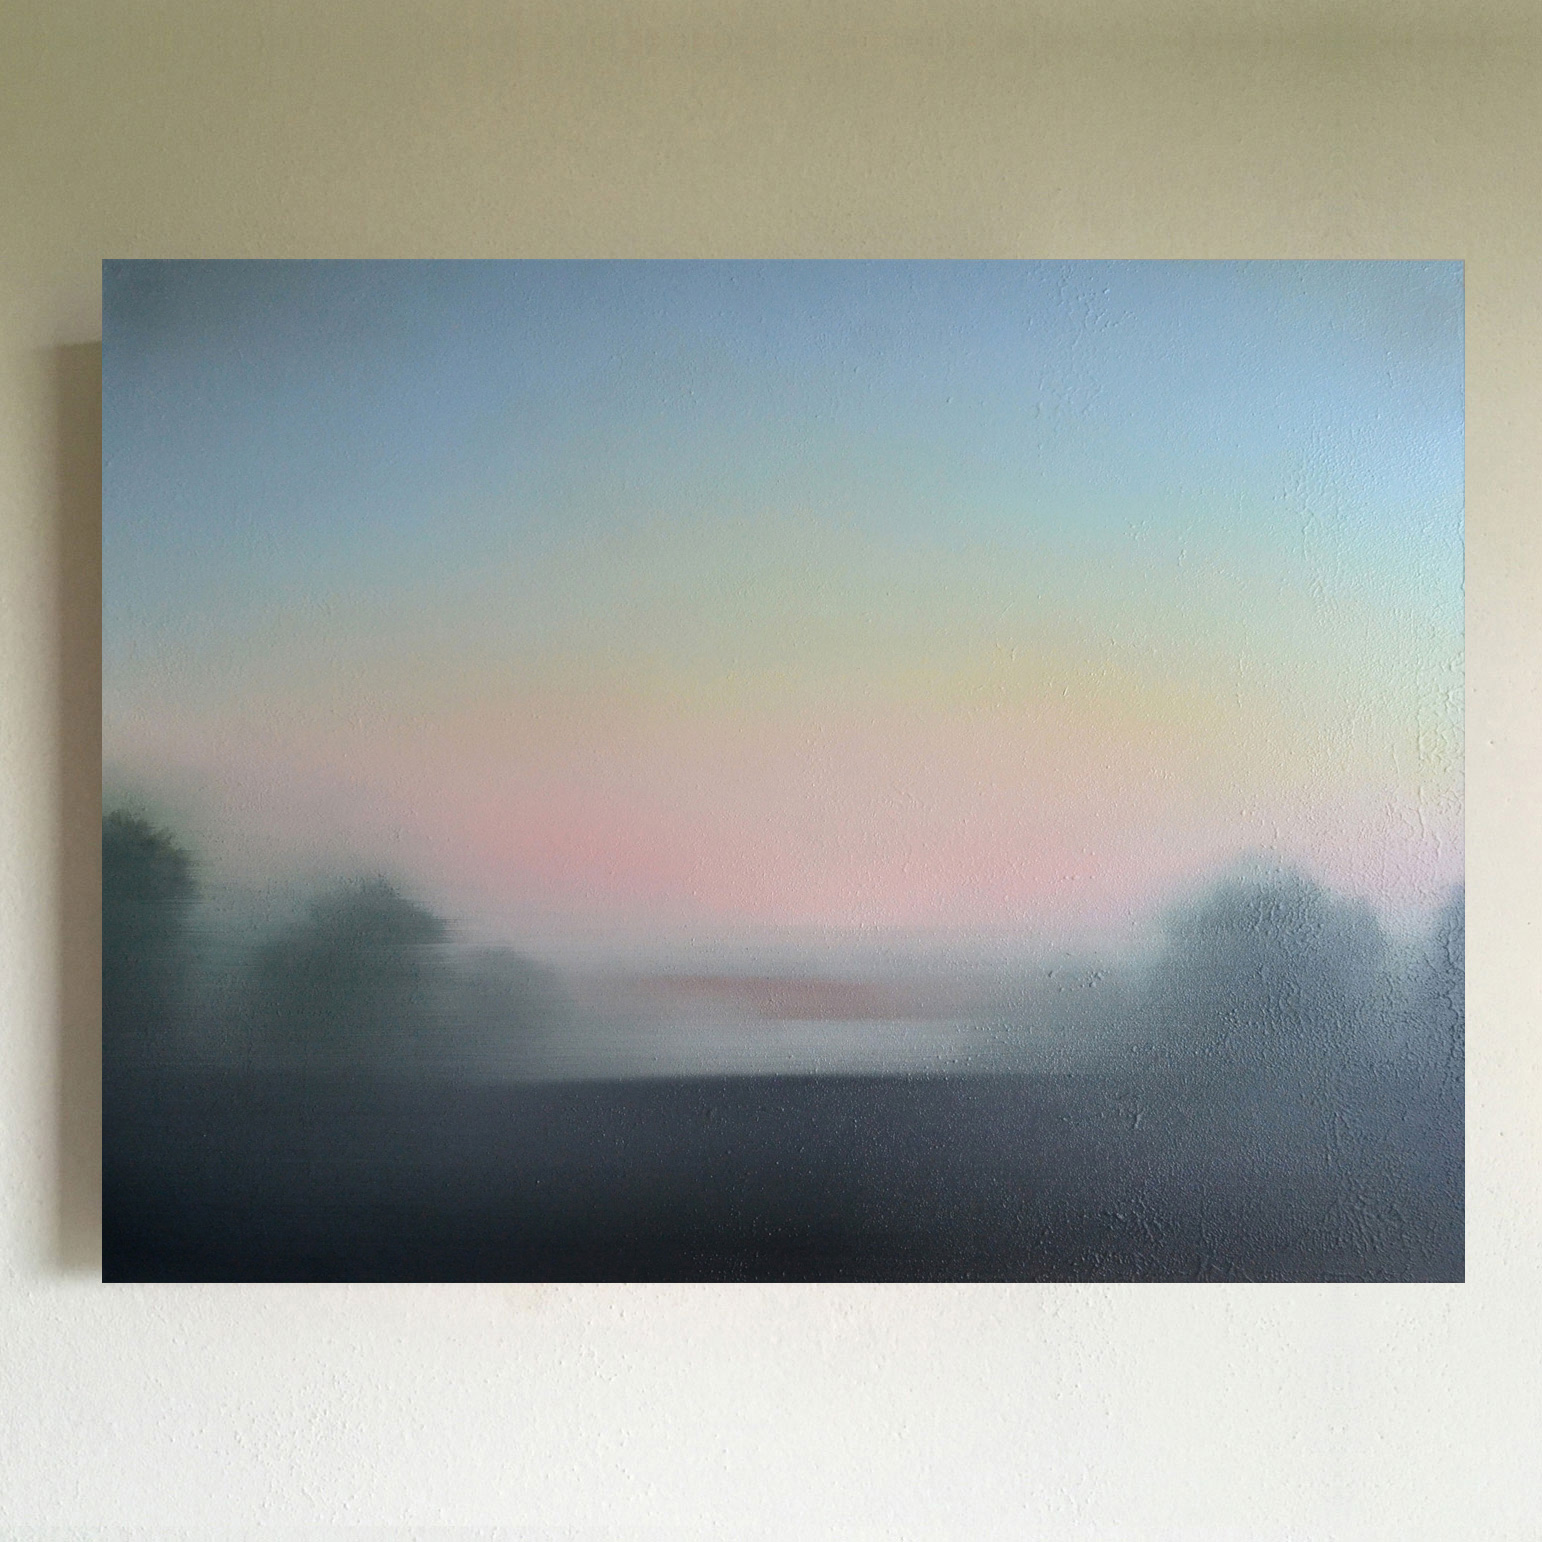 T#98-2015, oil on canvas, 90x110cm, priv. coll.